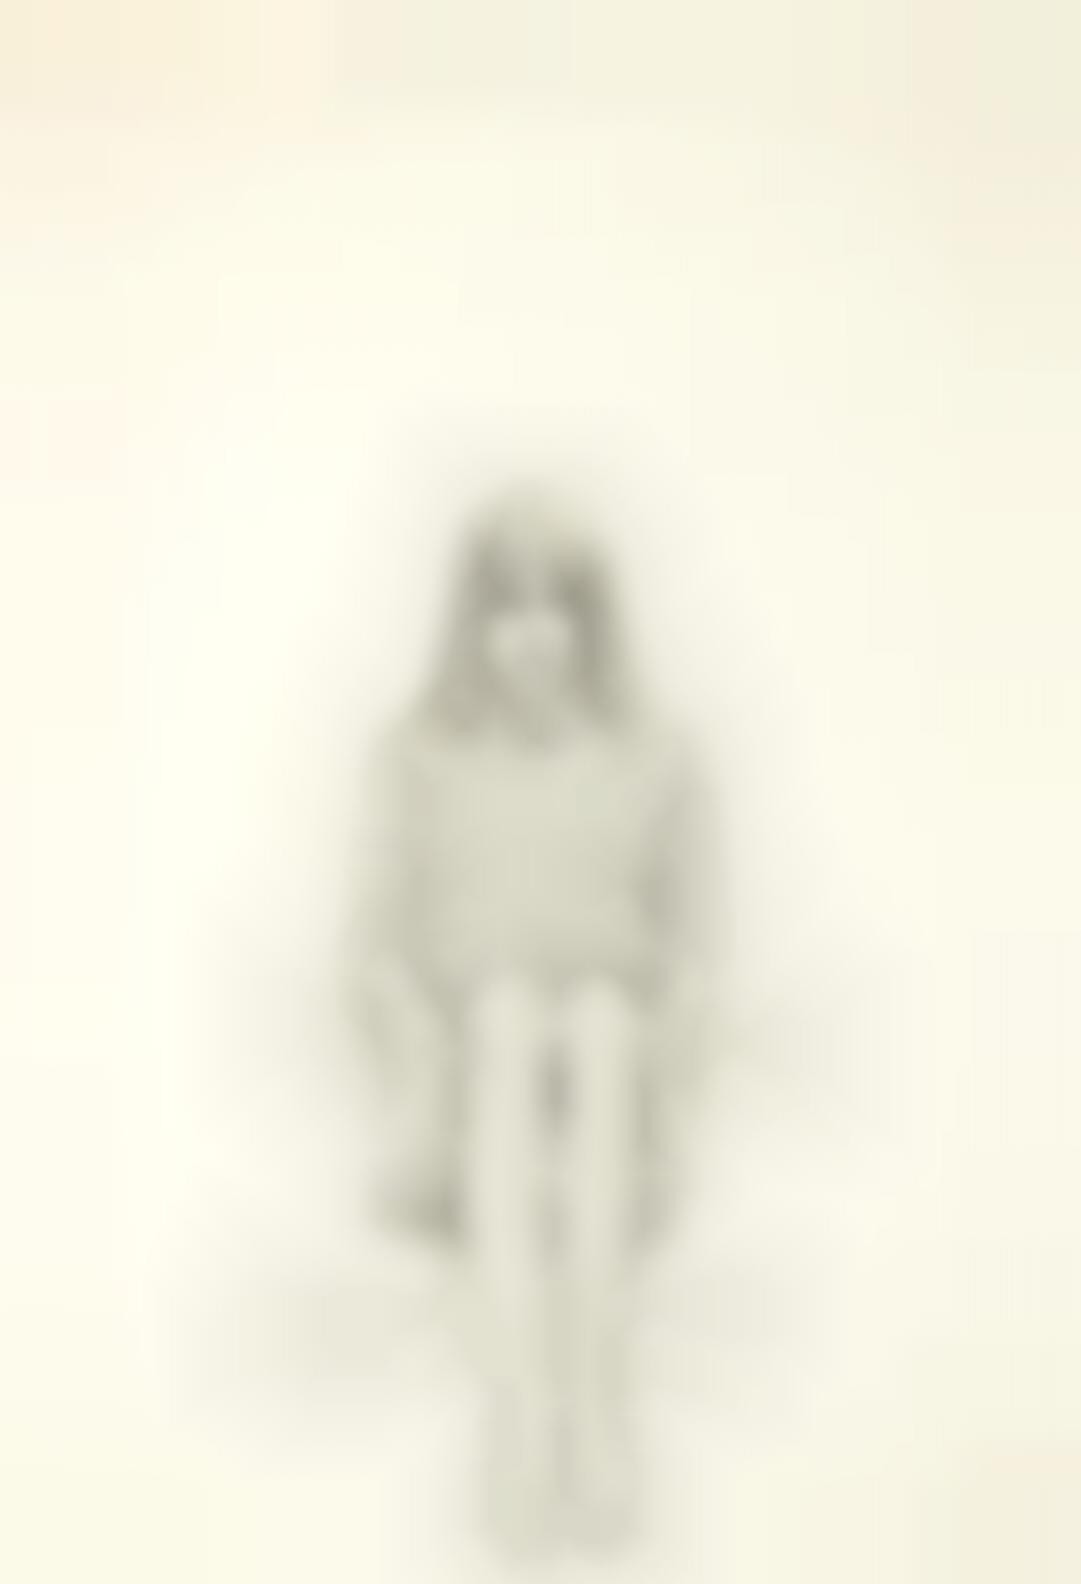 Wayne Thiebaud-Girl In Striped Sweater-1965